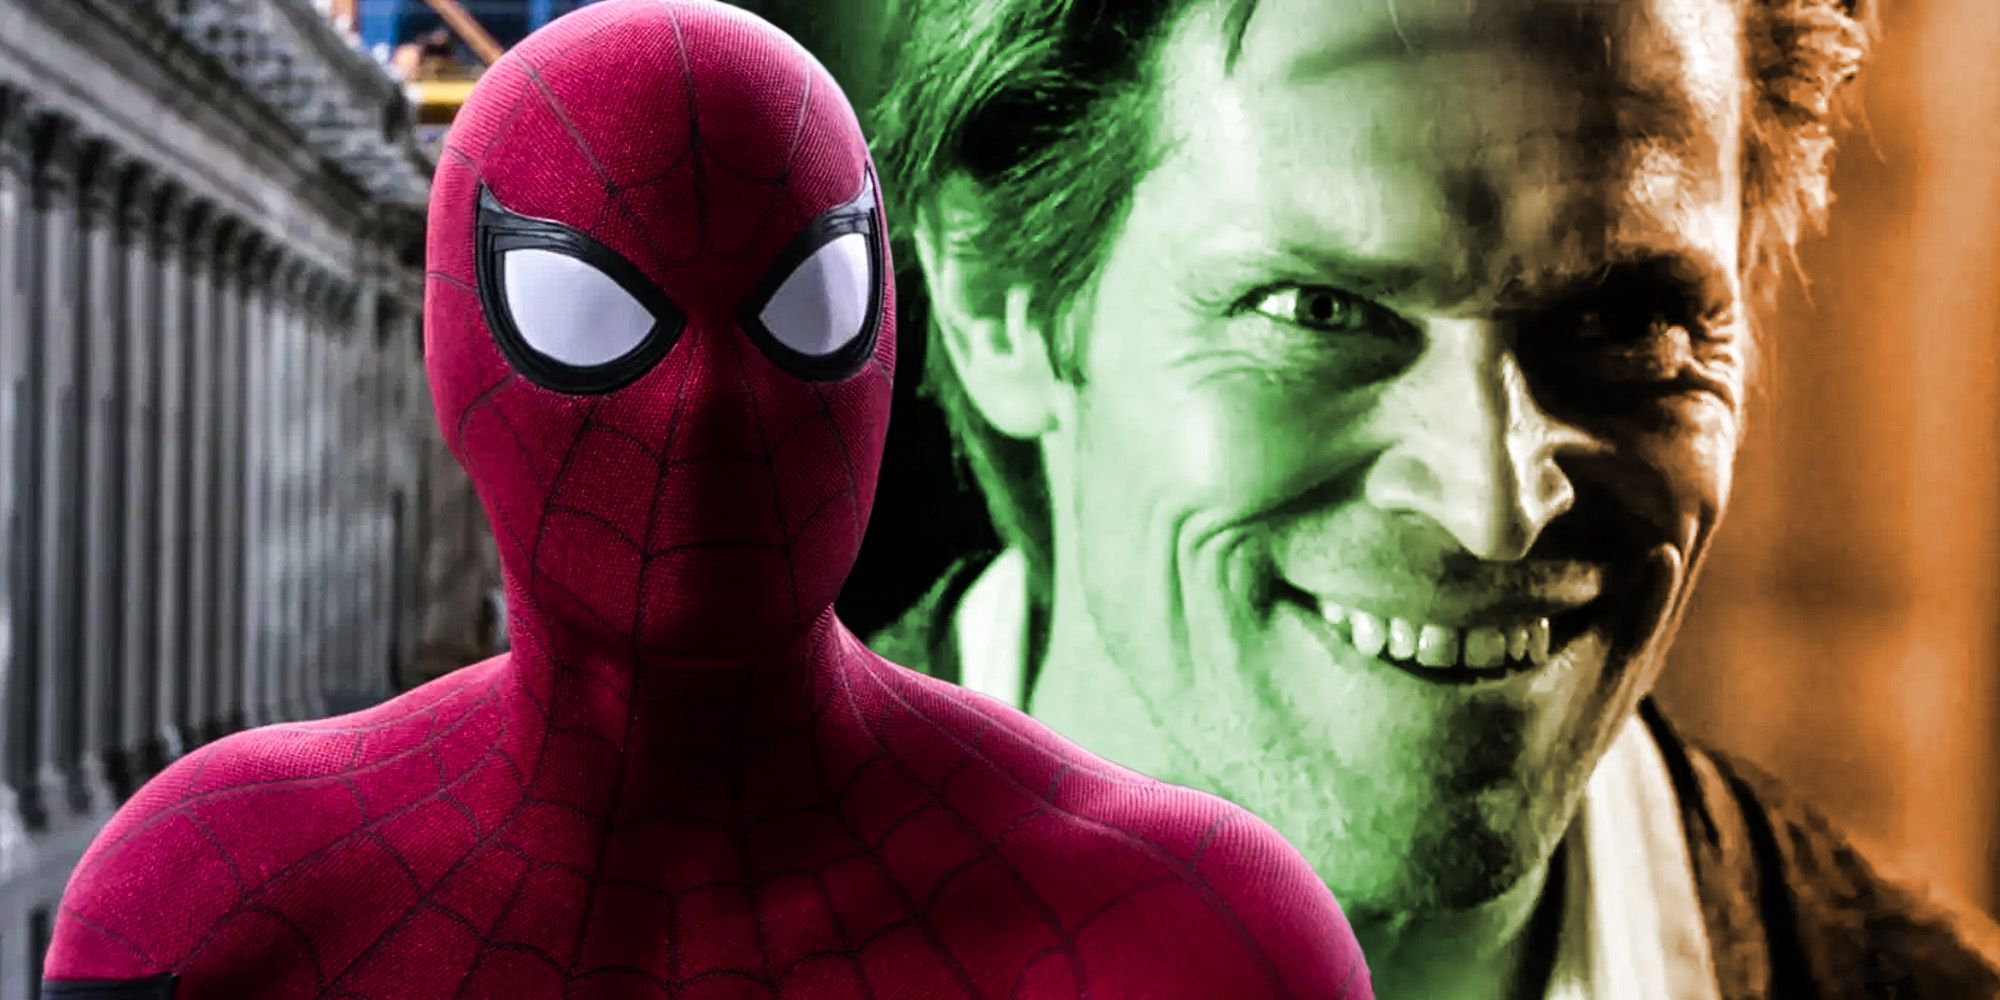 Spider-Man 3's Main Villain Rumored To Be Willem Dafoe's Green Goblin